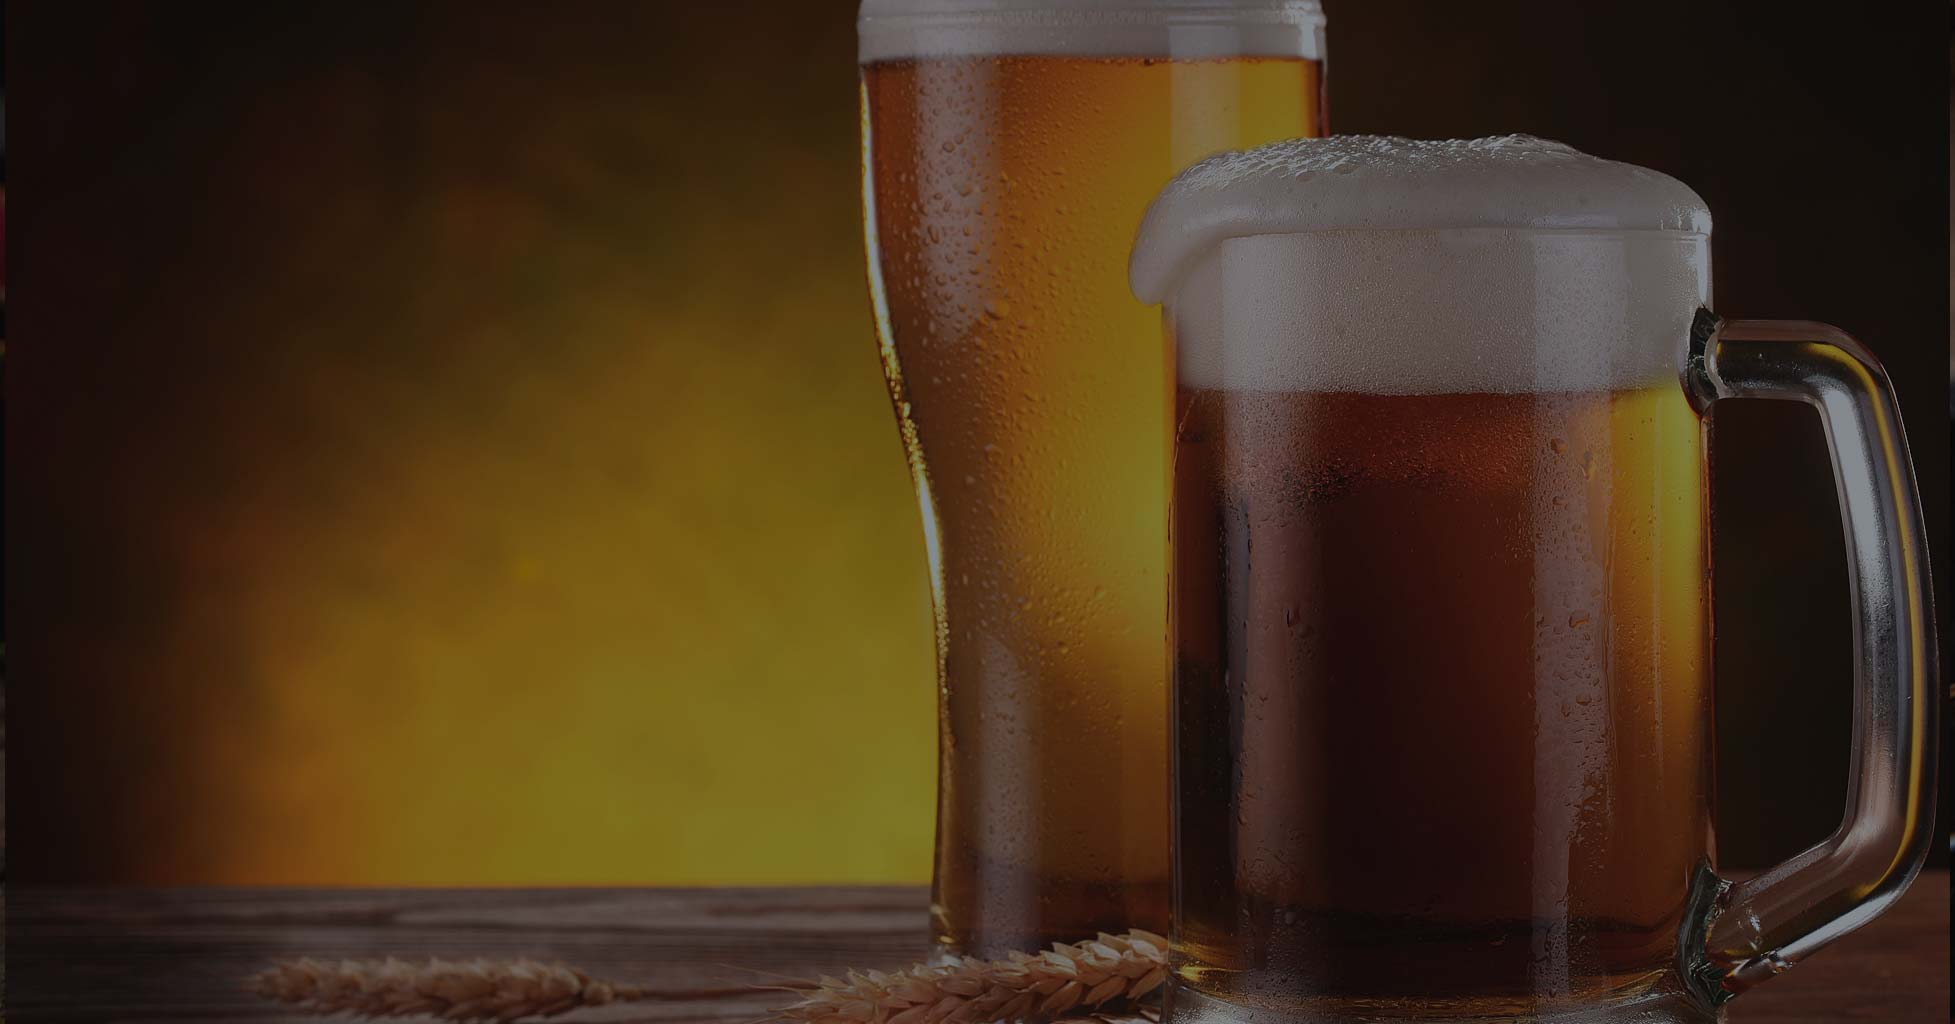 МЕНЮ — Пиво